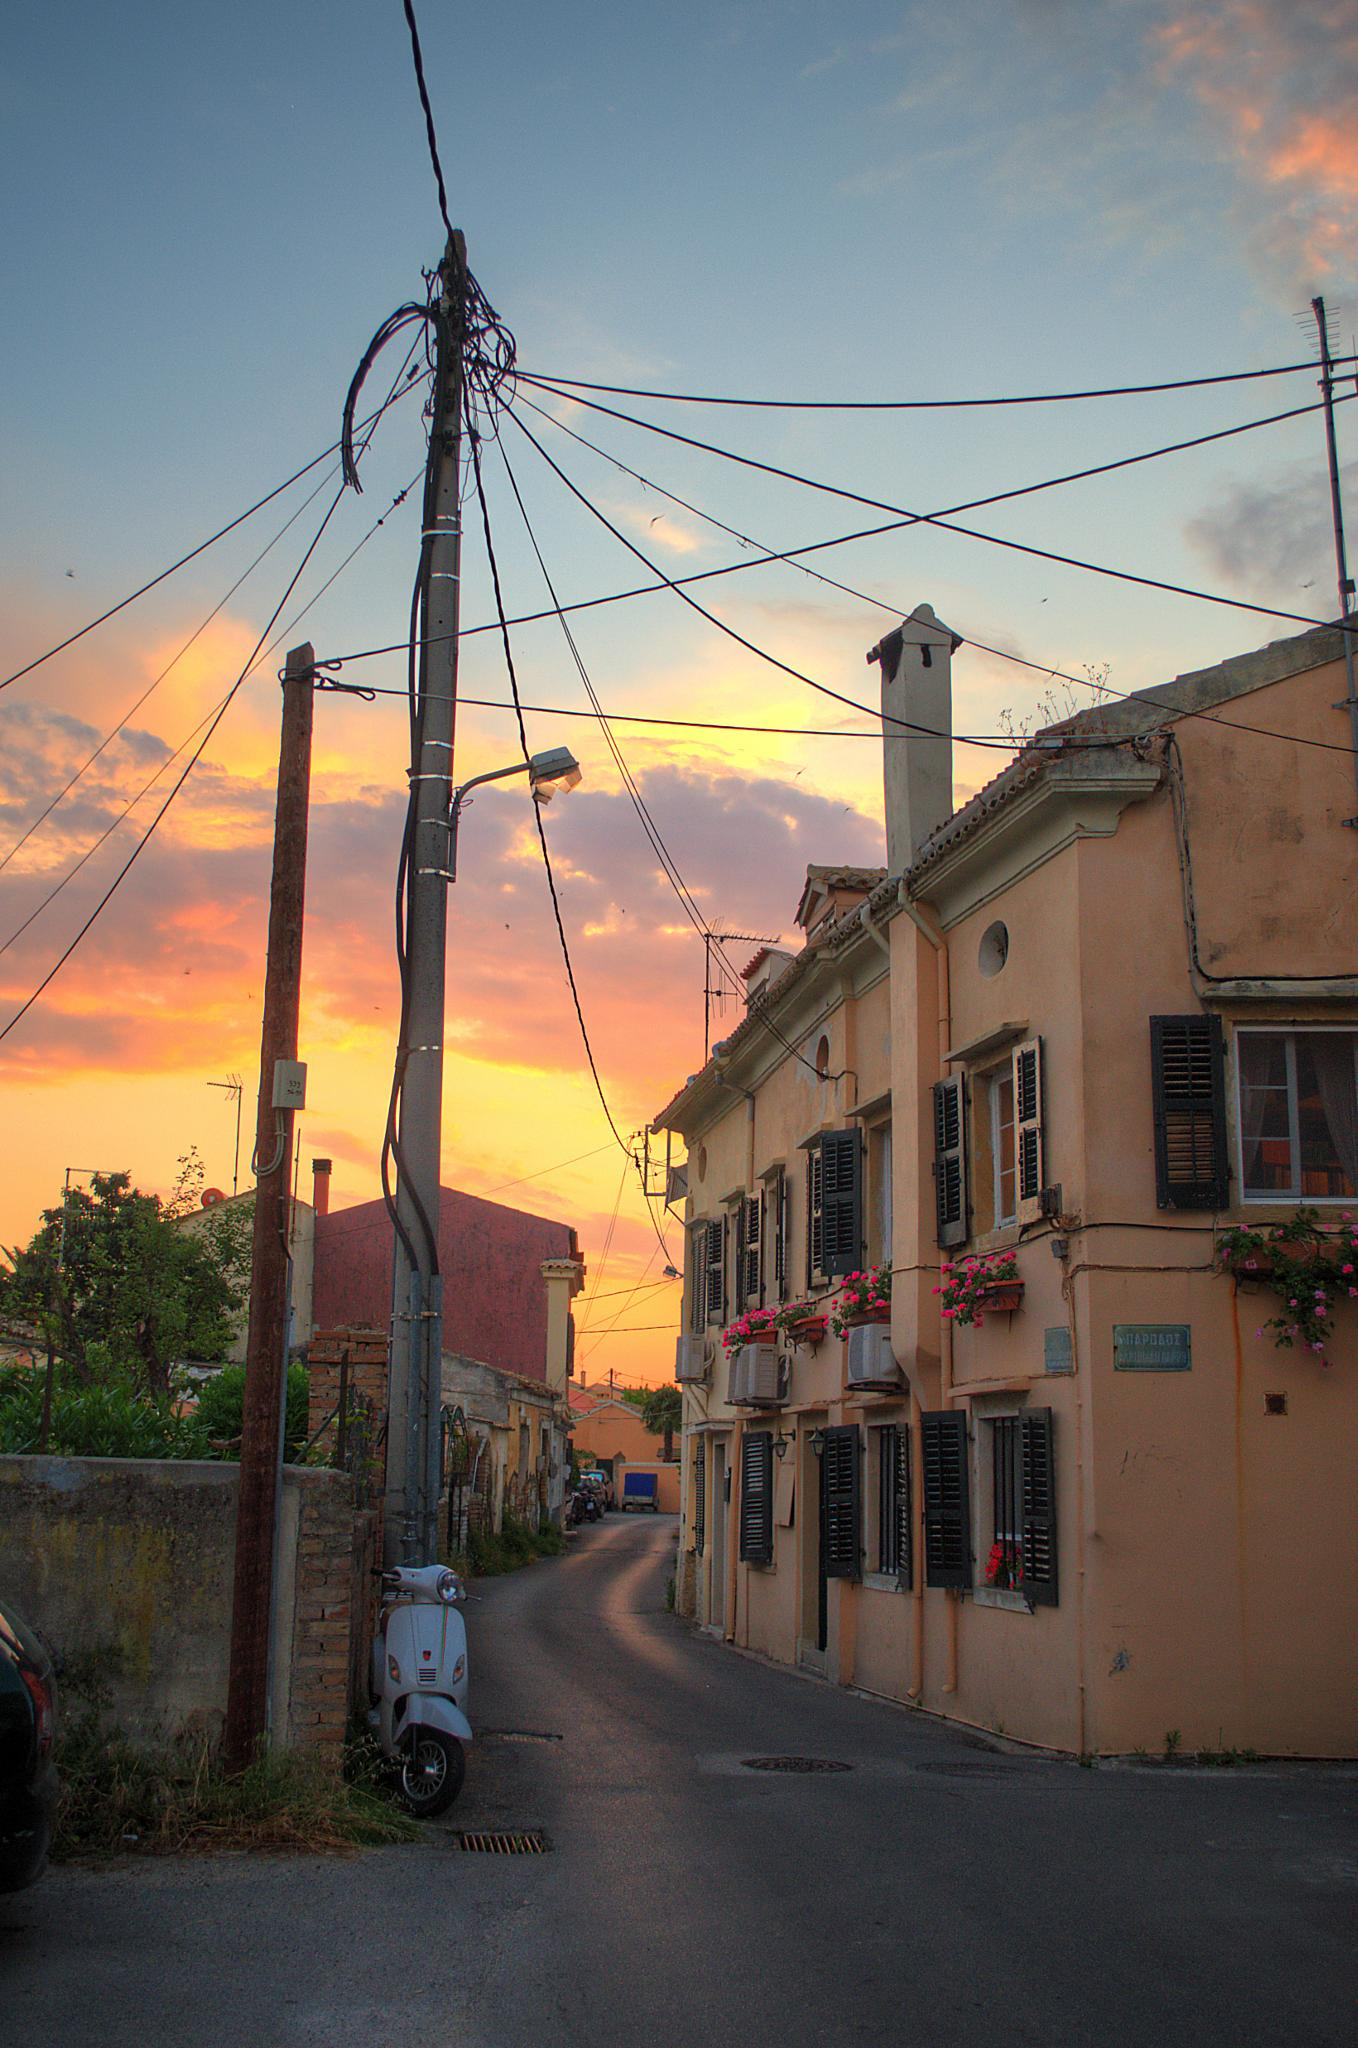 Returning home by  Sotiris Hartzavalos